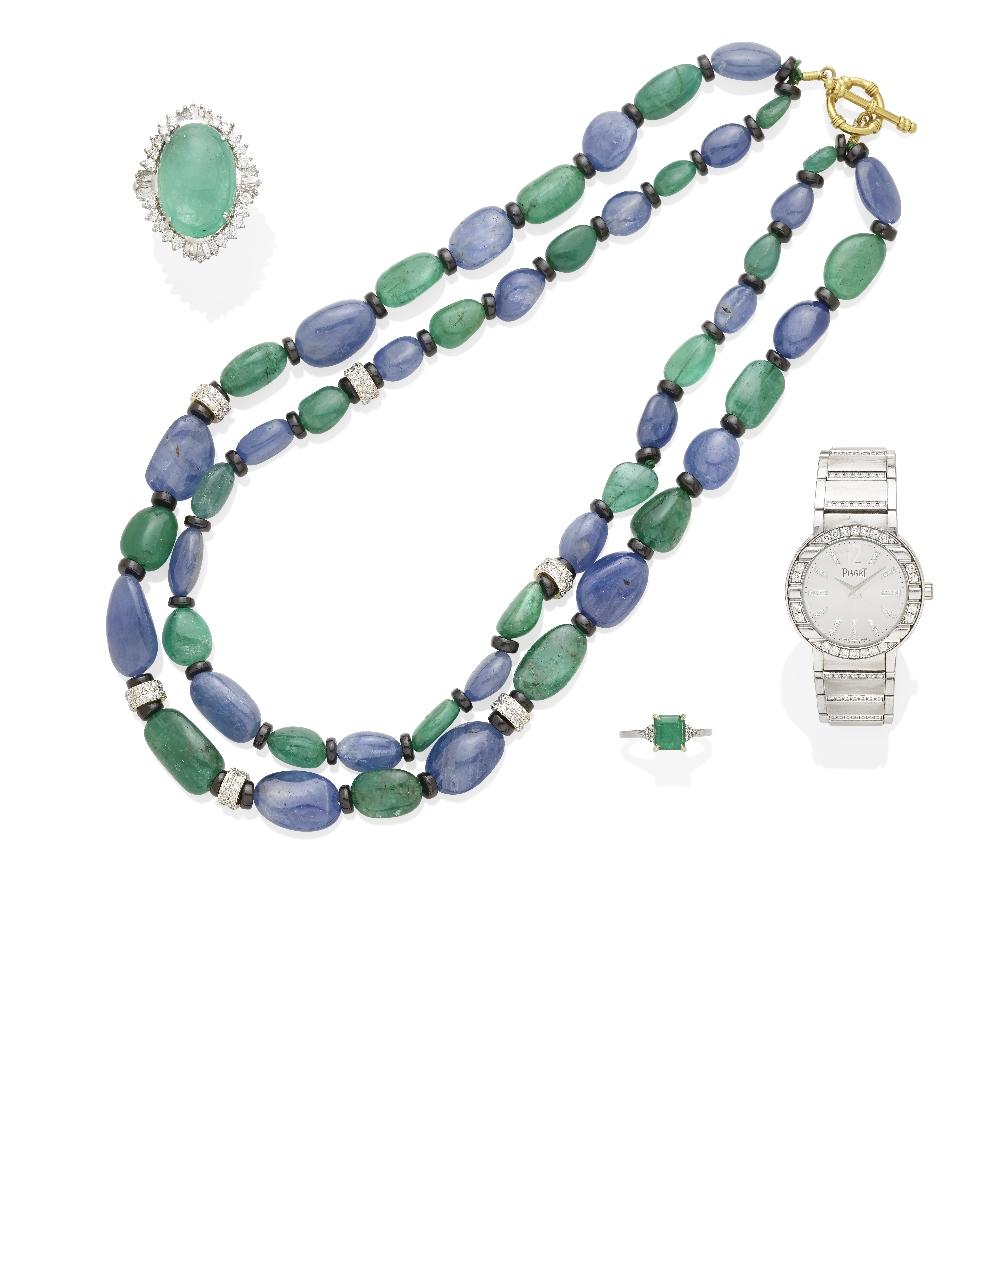 A Lady's Diamond and 18k White Gold 'Polo' Bracelet Watch, Piaget